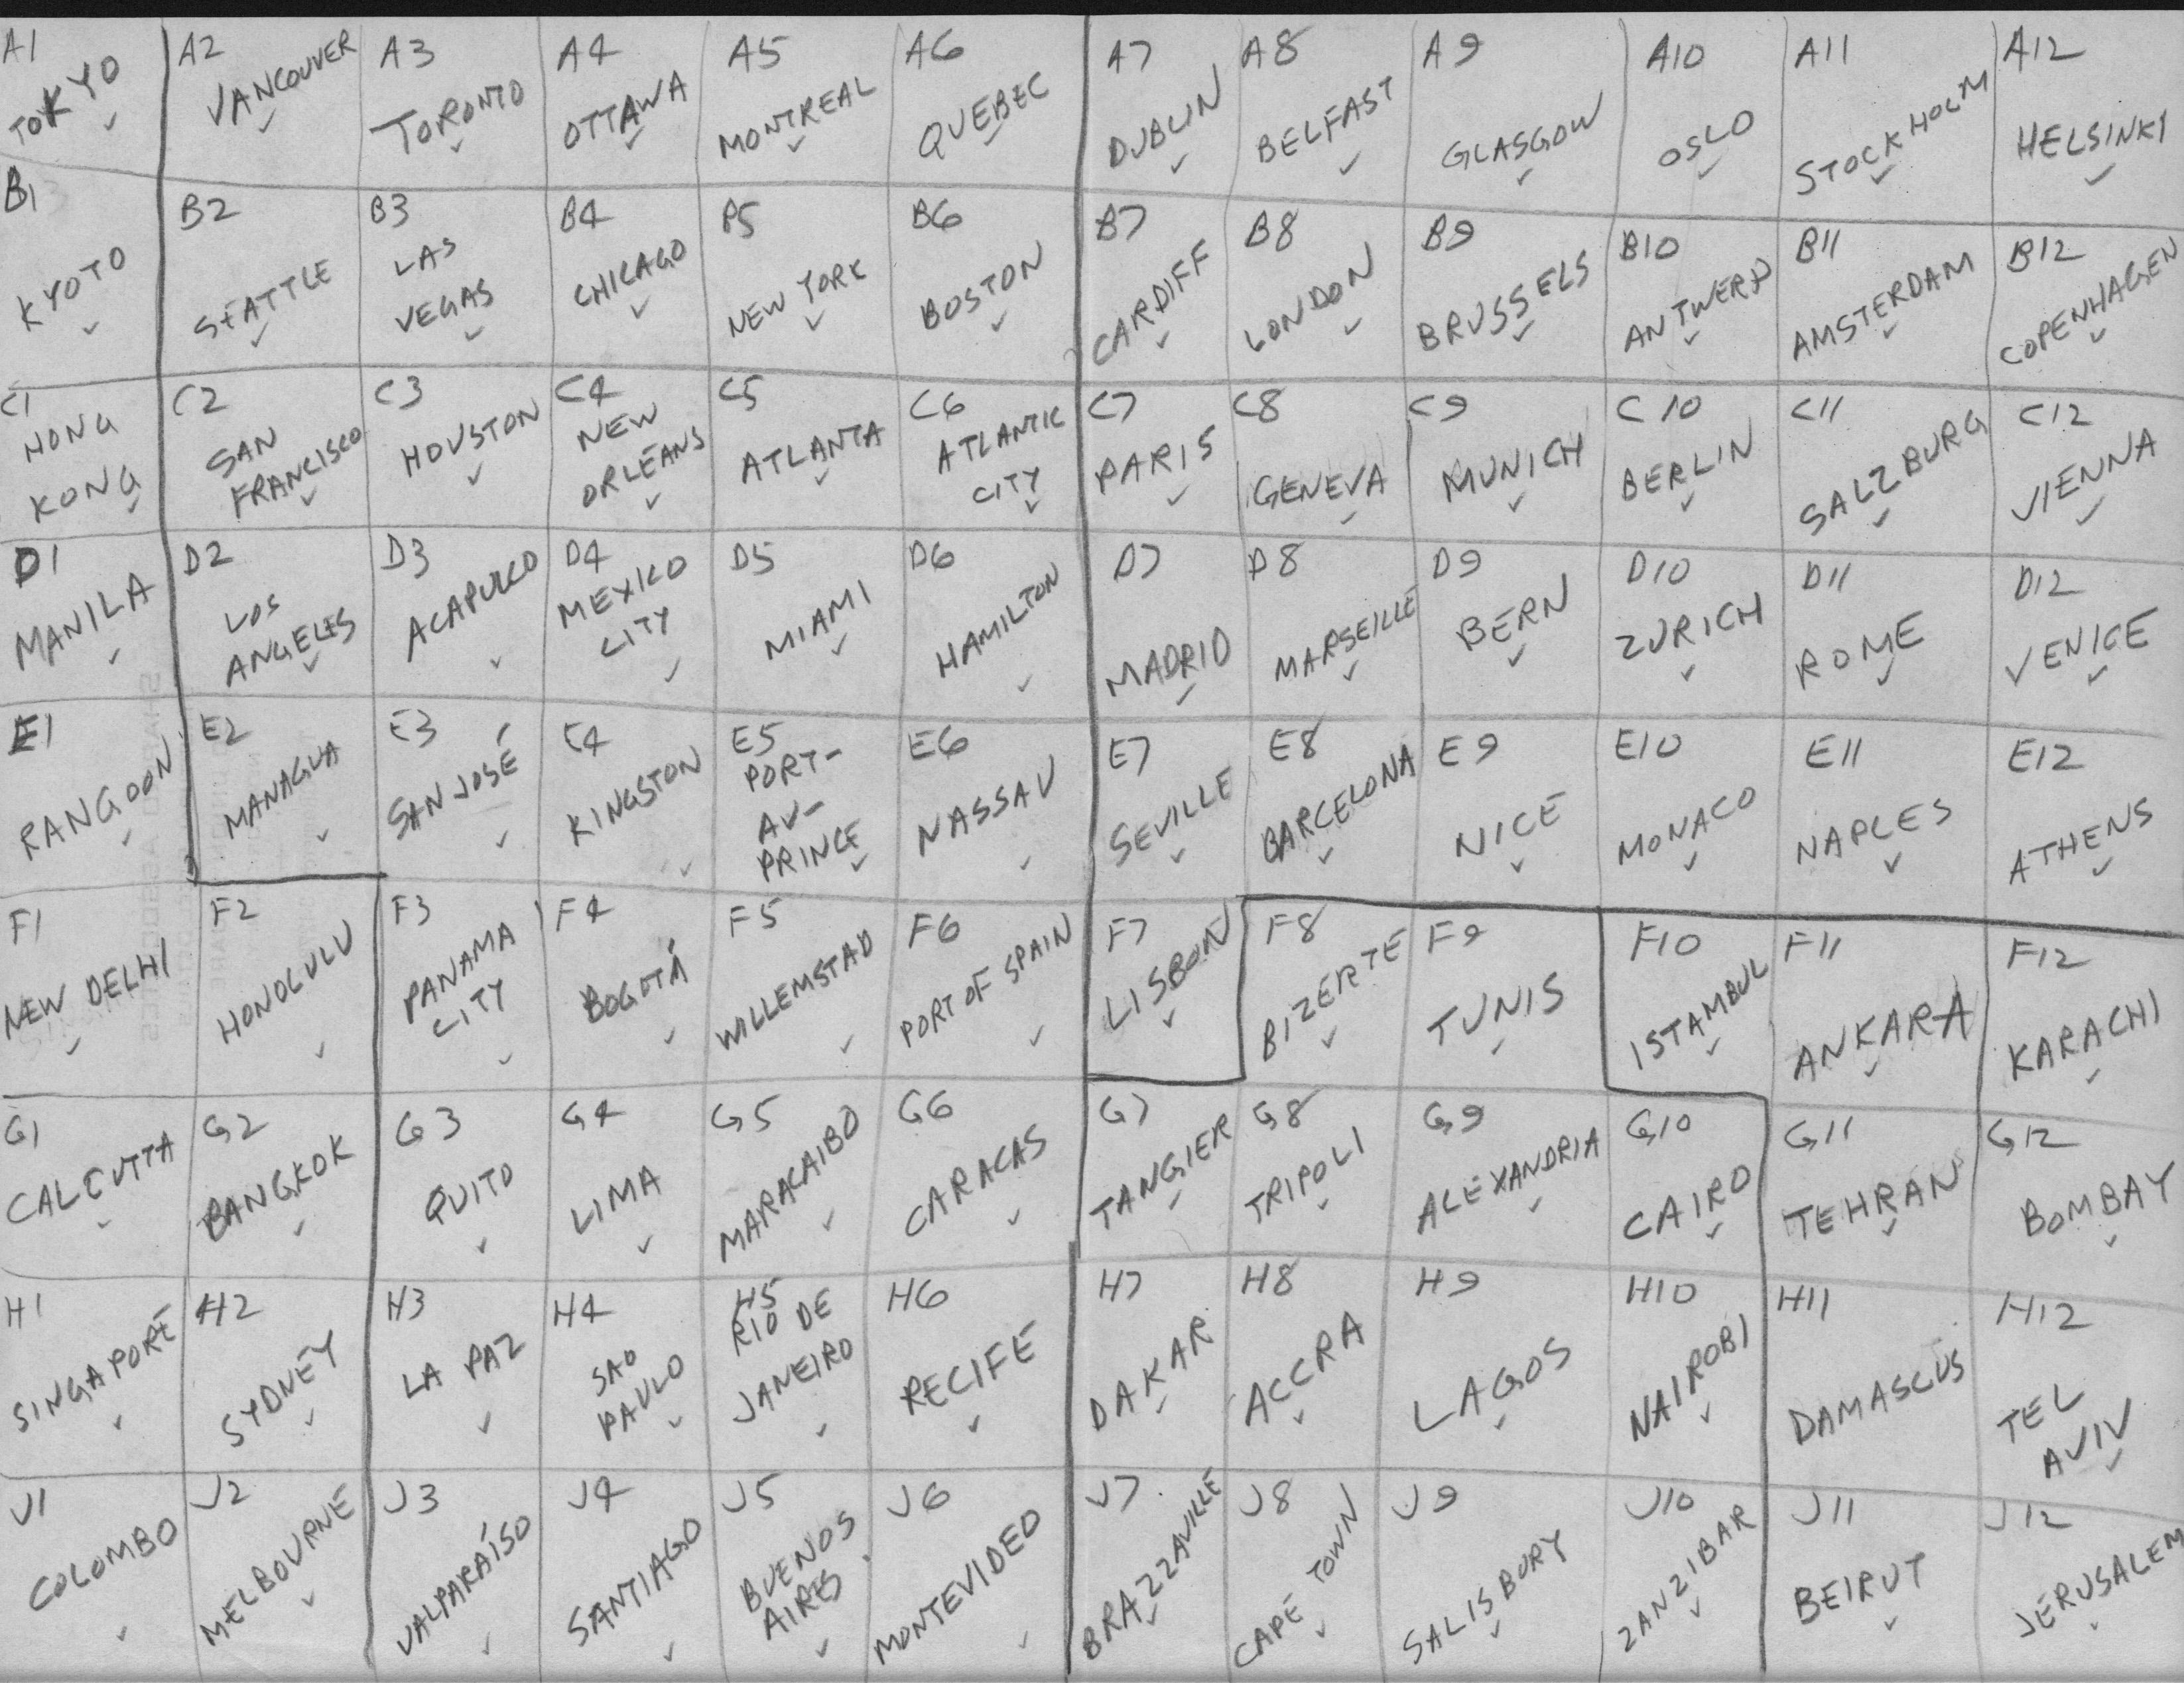 VACATION Manuscript - Page 12